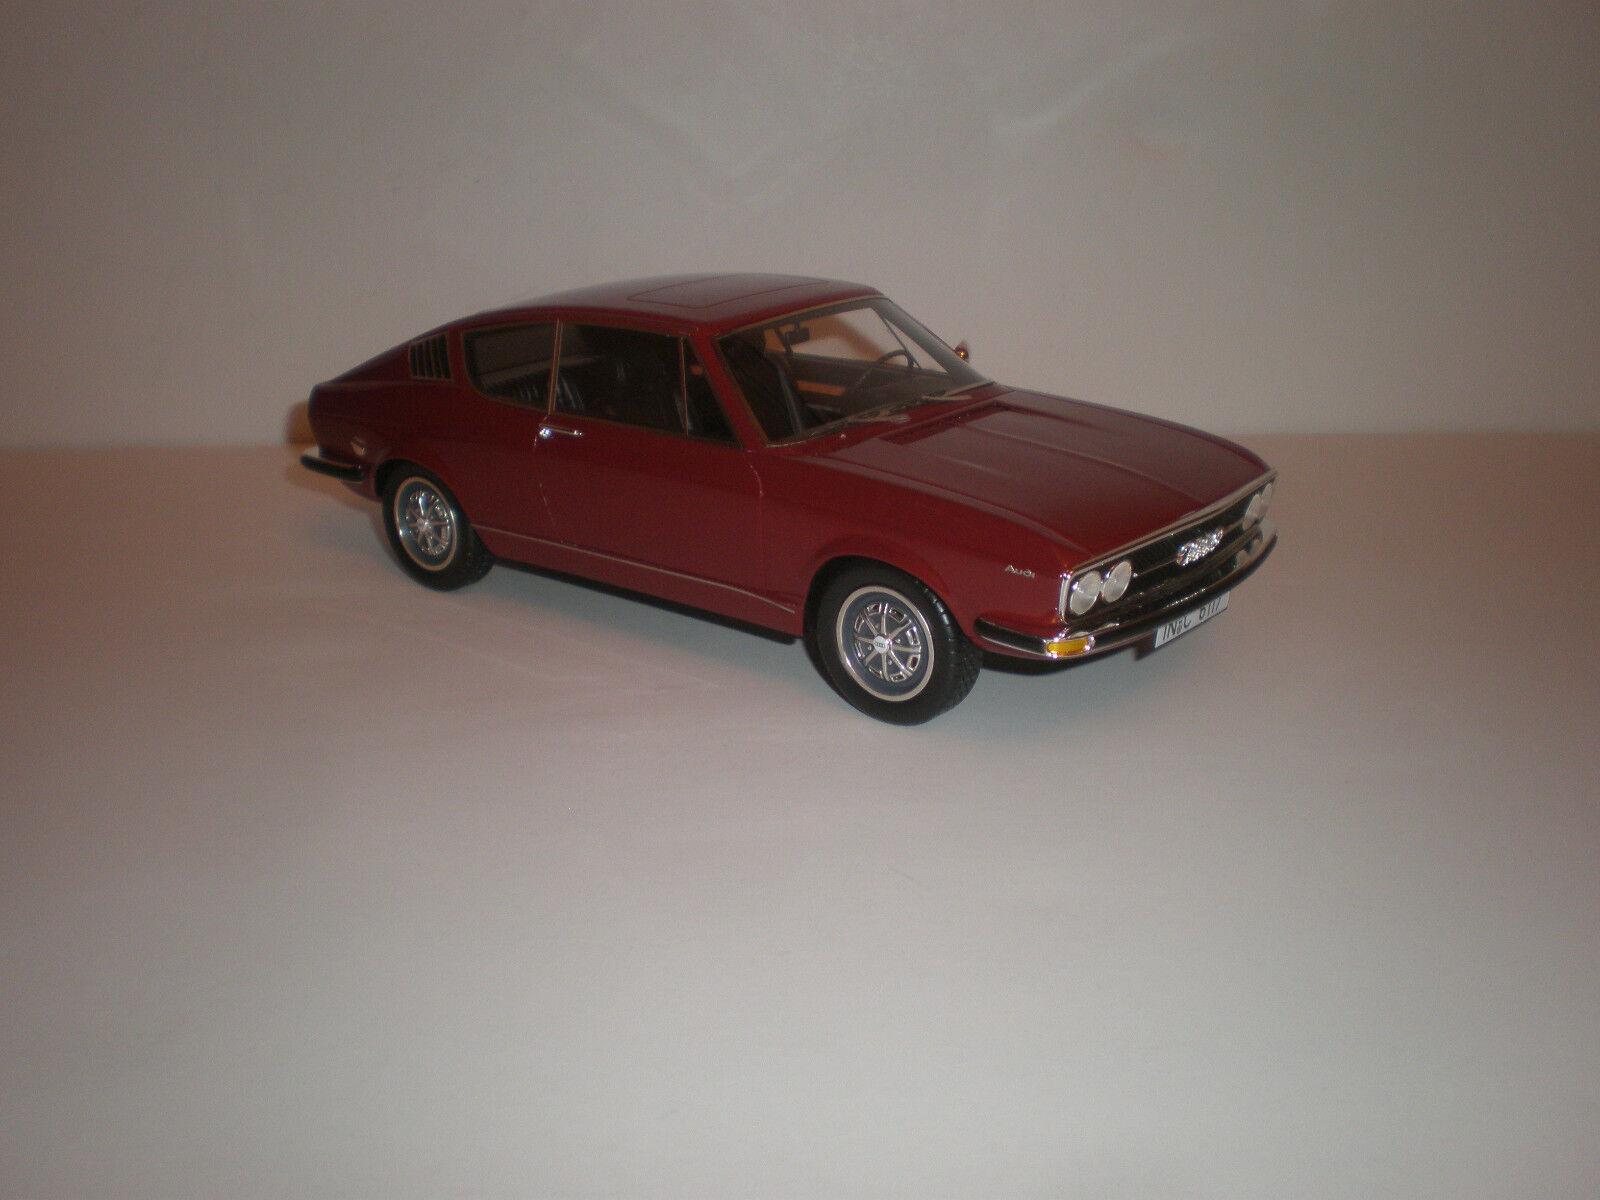 1 18 1970 AUDI 100 Coupe darröd LE 400 pcs. KK skala